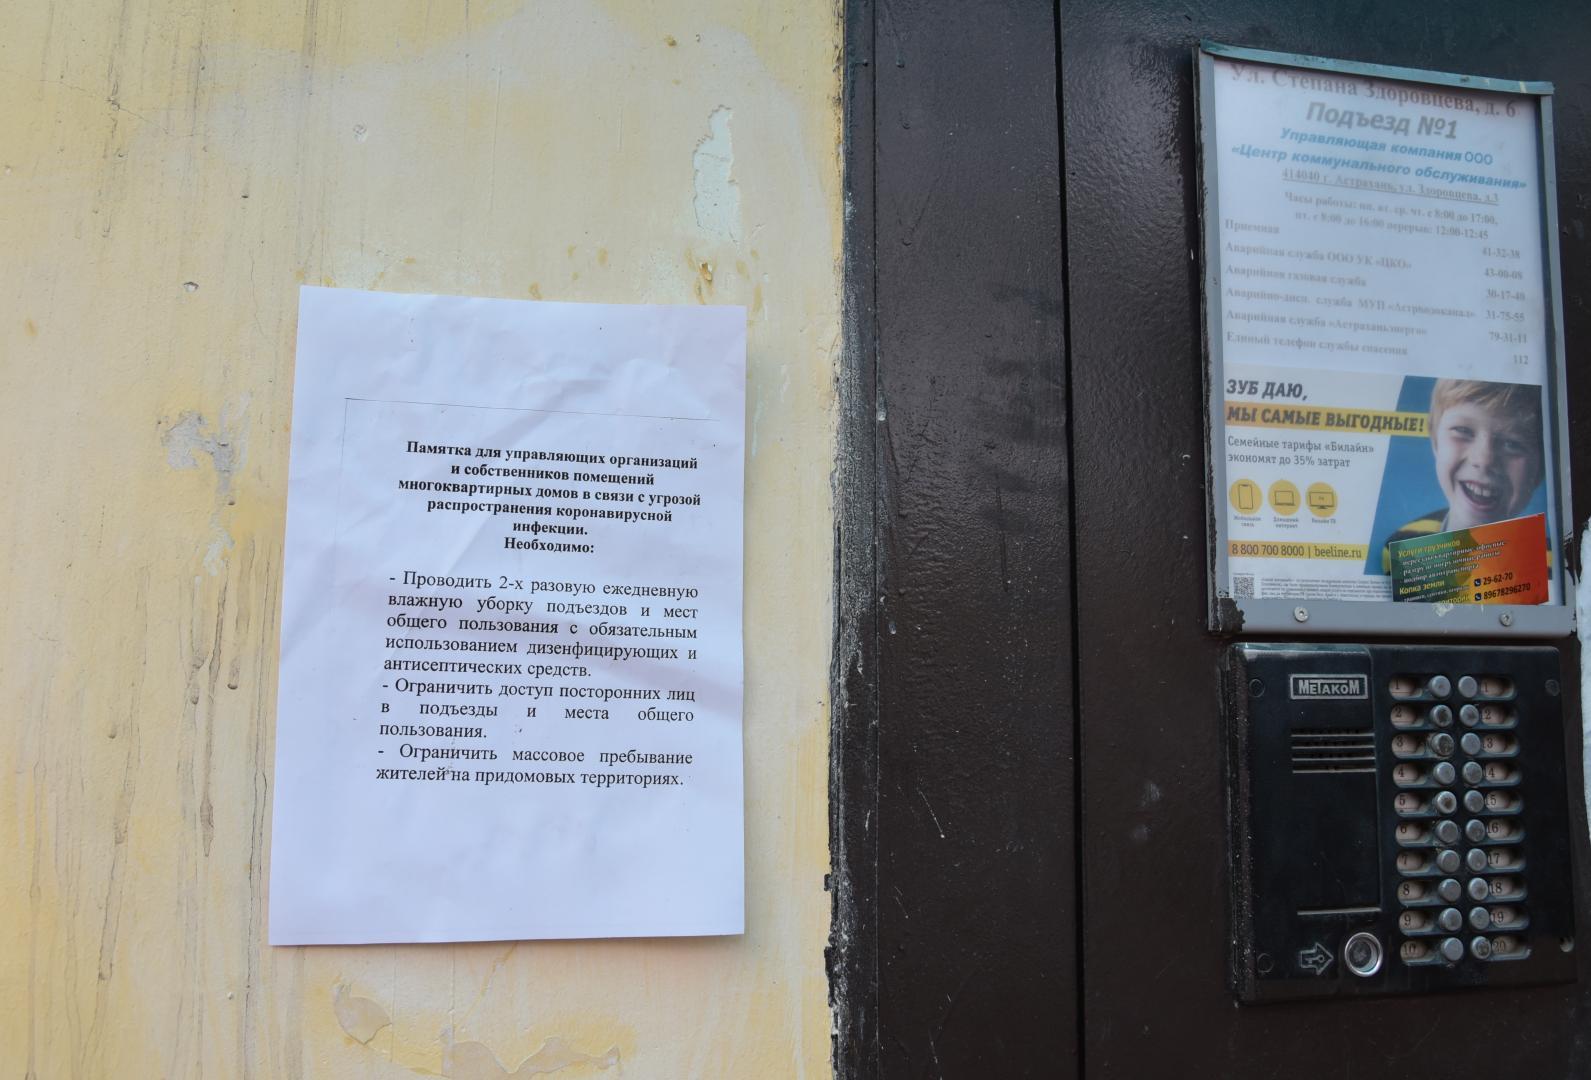 Астраханские власти рекомендуют влажную уборку подъездов и маршруток в связи с COVID-19